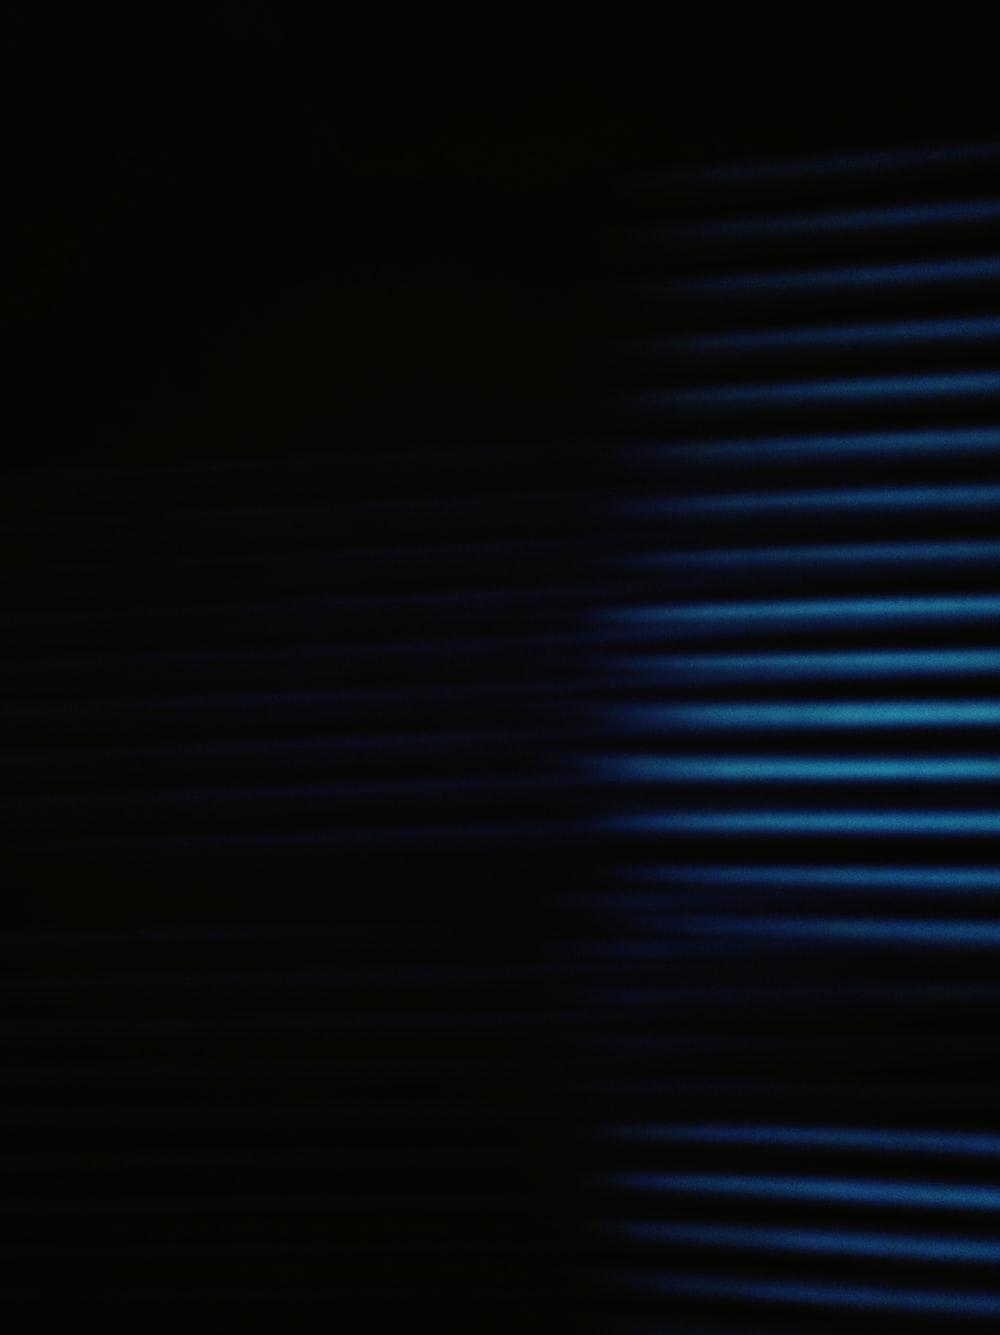 white window blinds in dark room